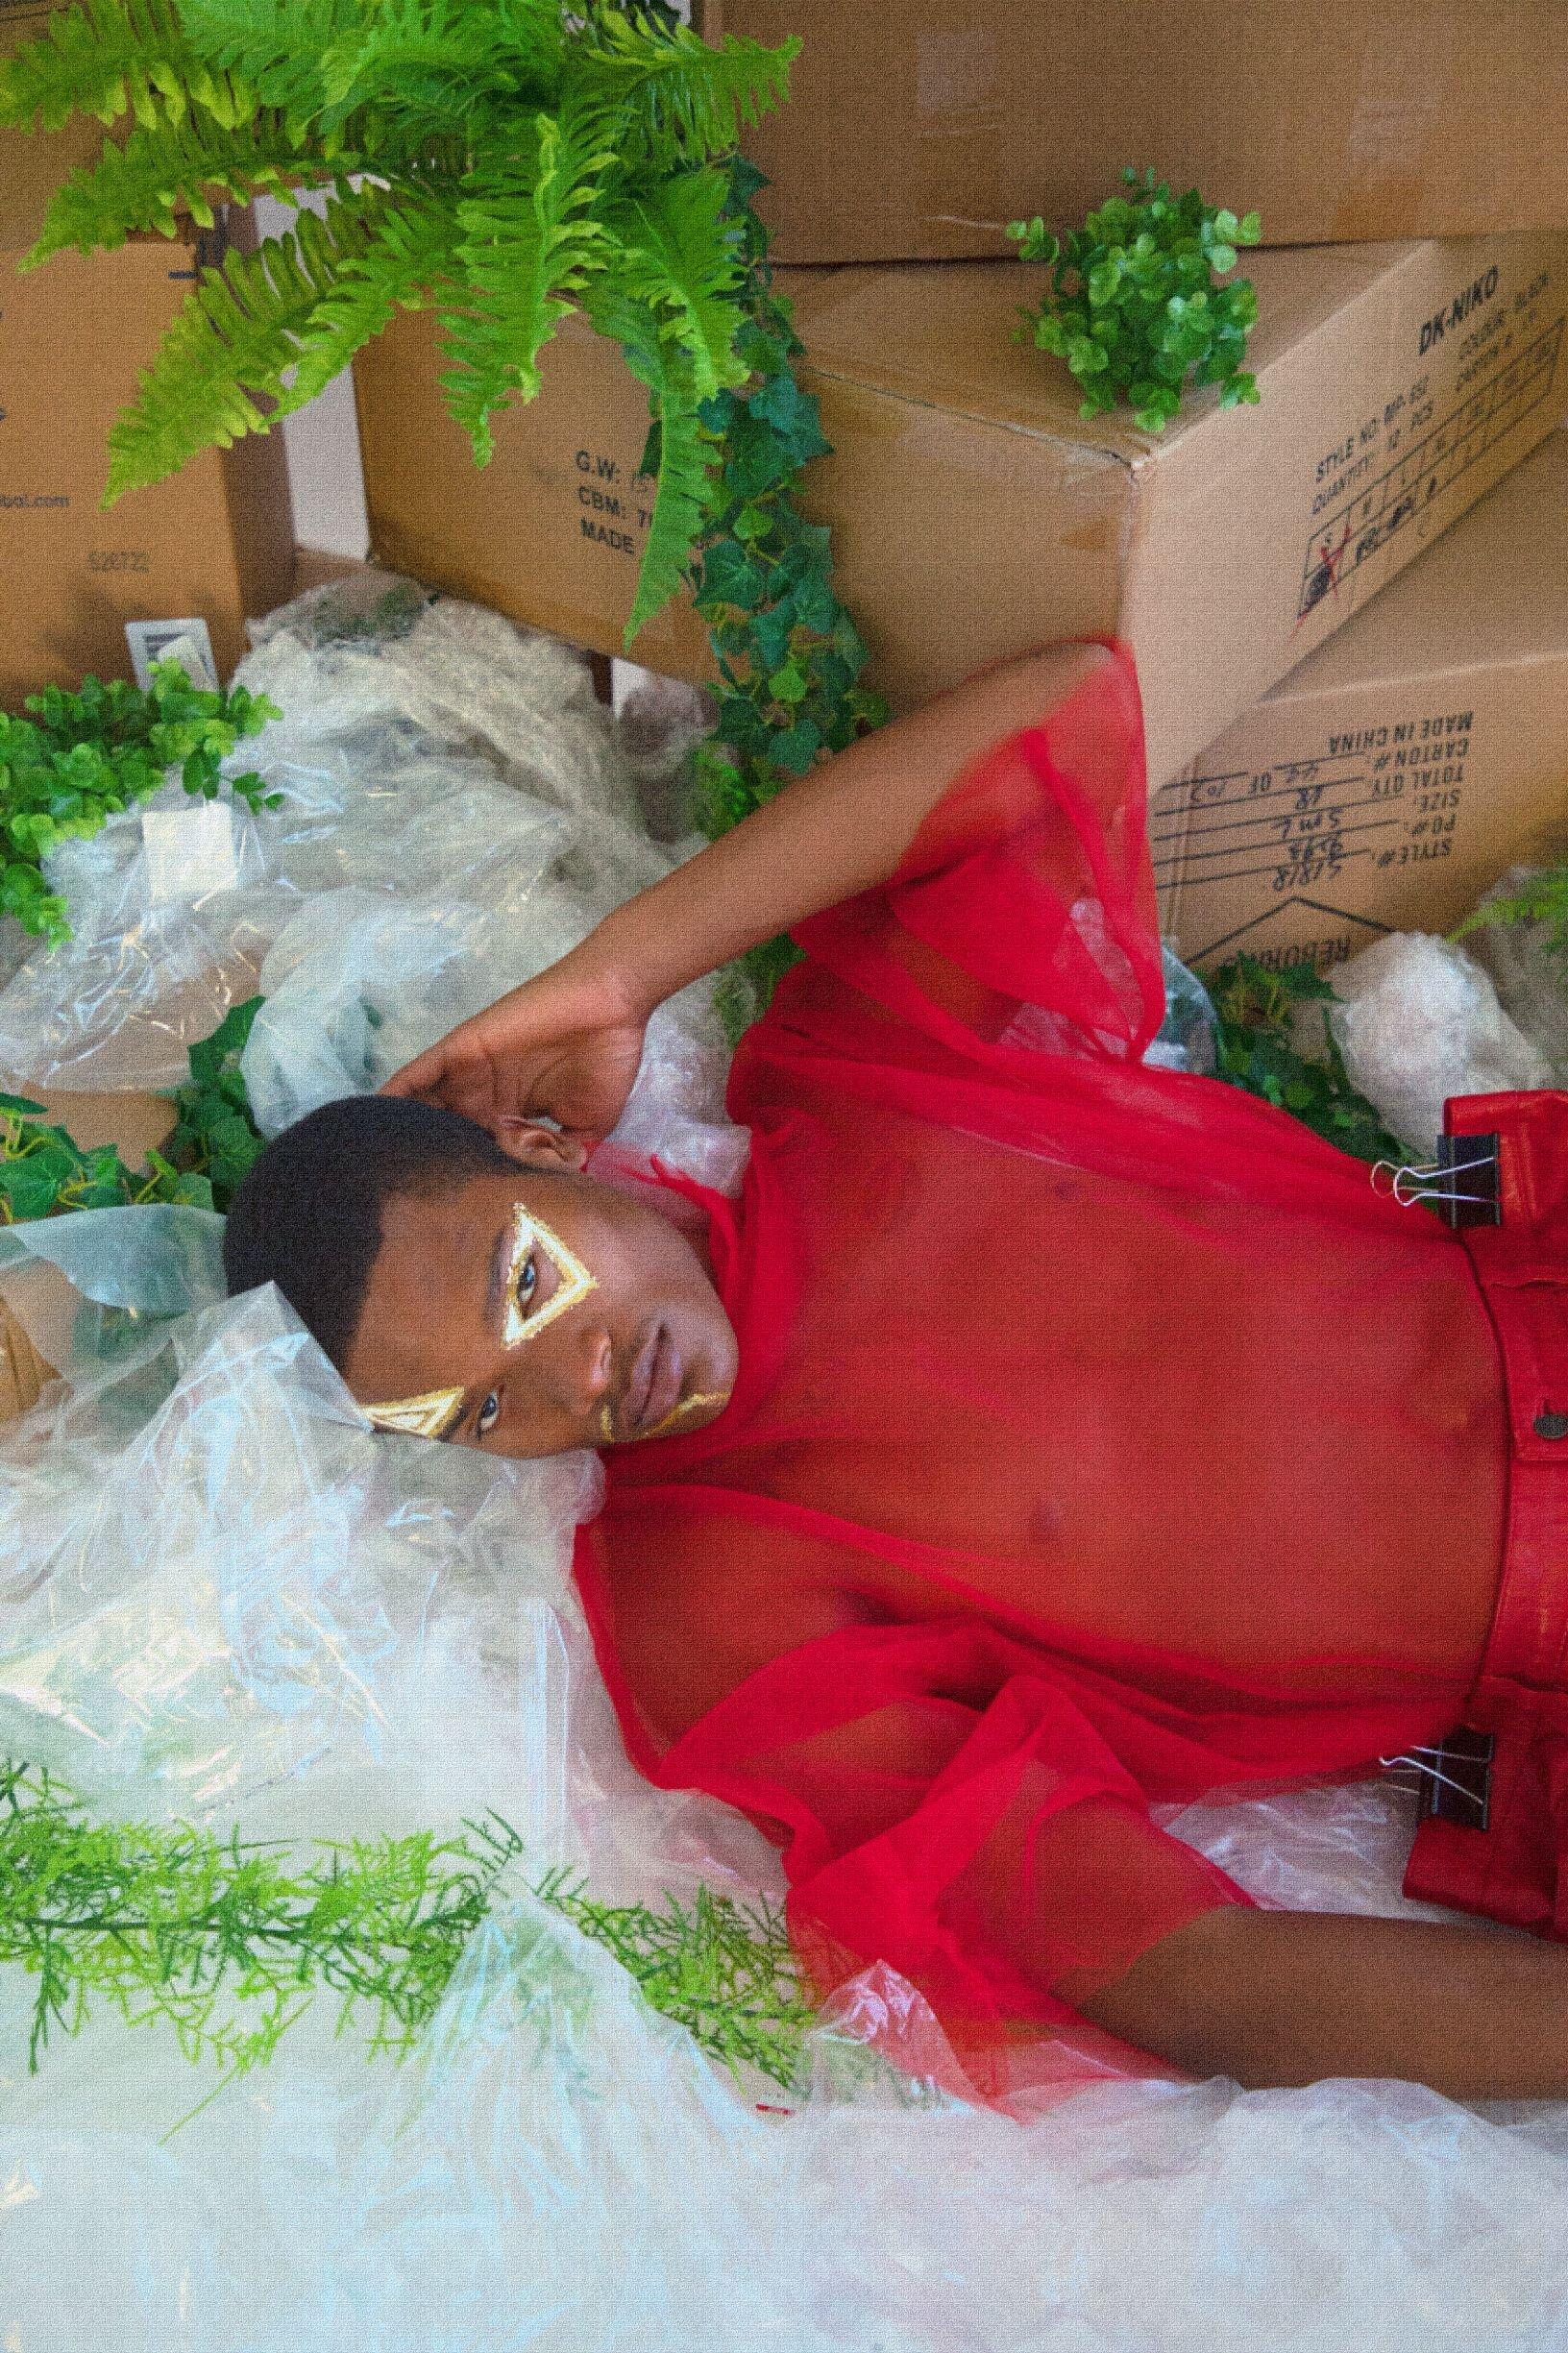 Model amid sea of plastic showcasing harm to the environment